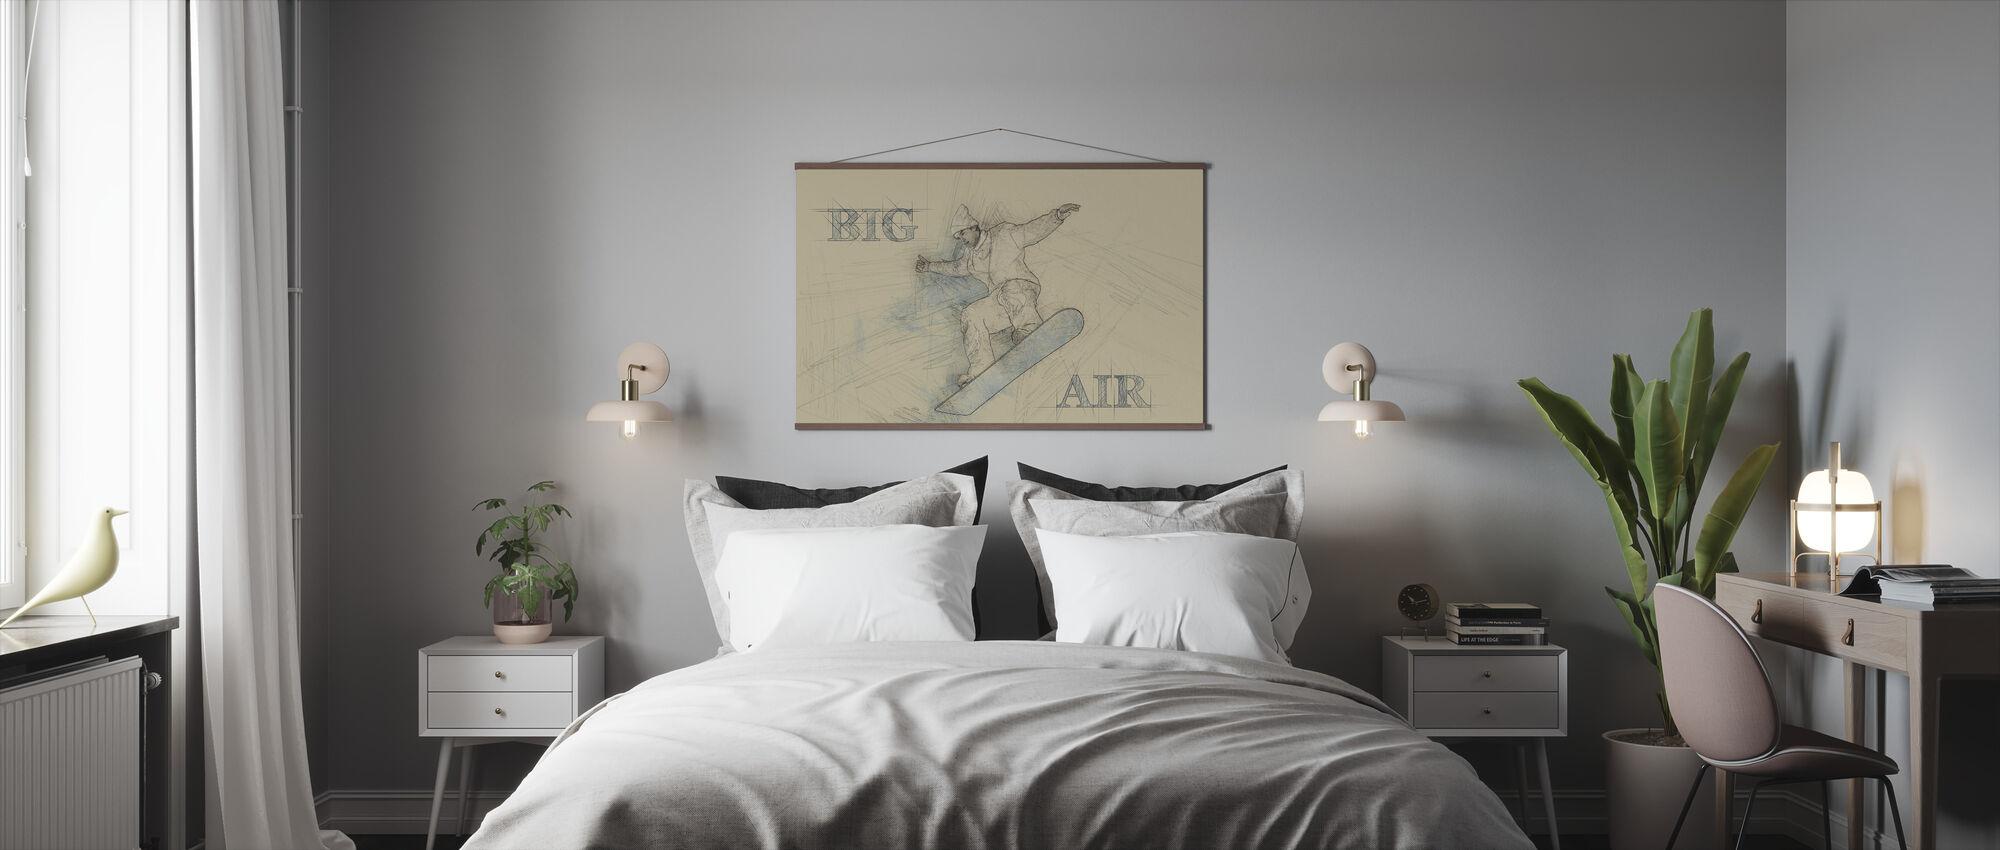 Iso ilma - Juliste - Makuuhuone